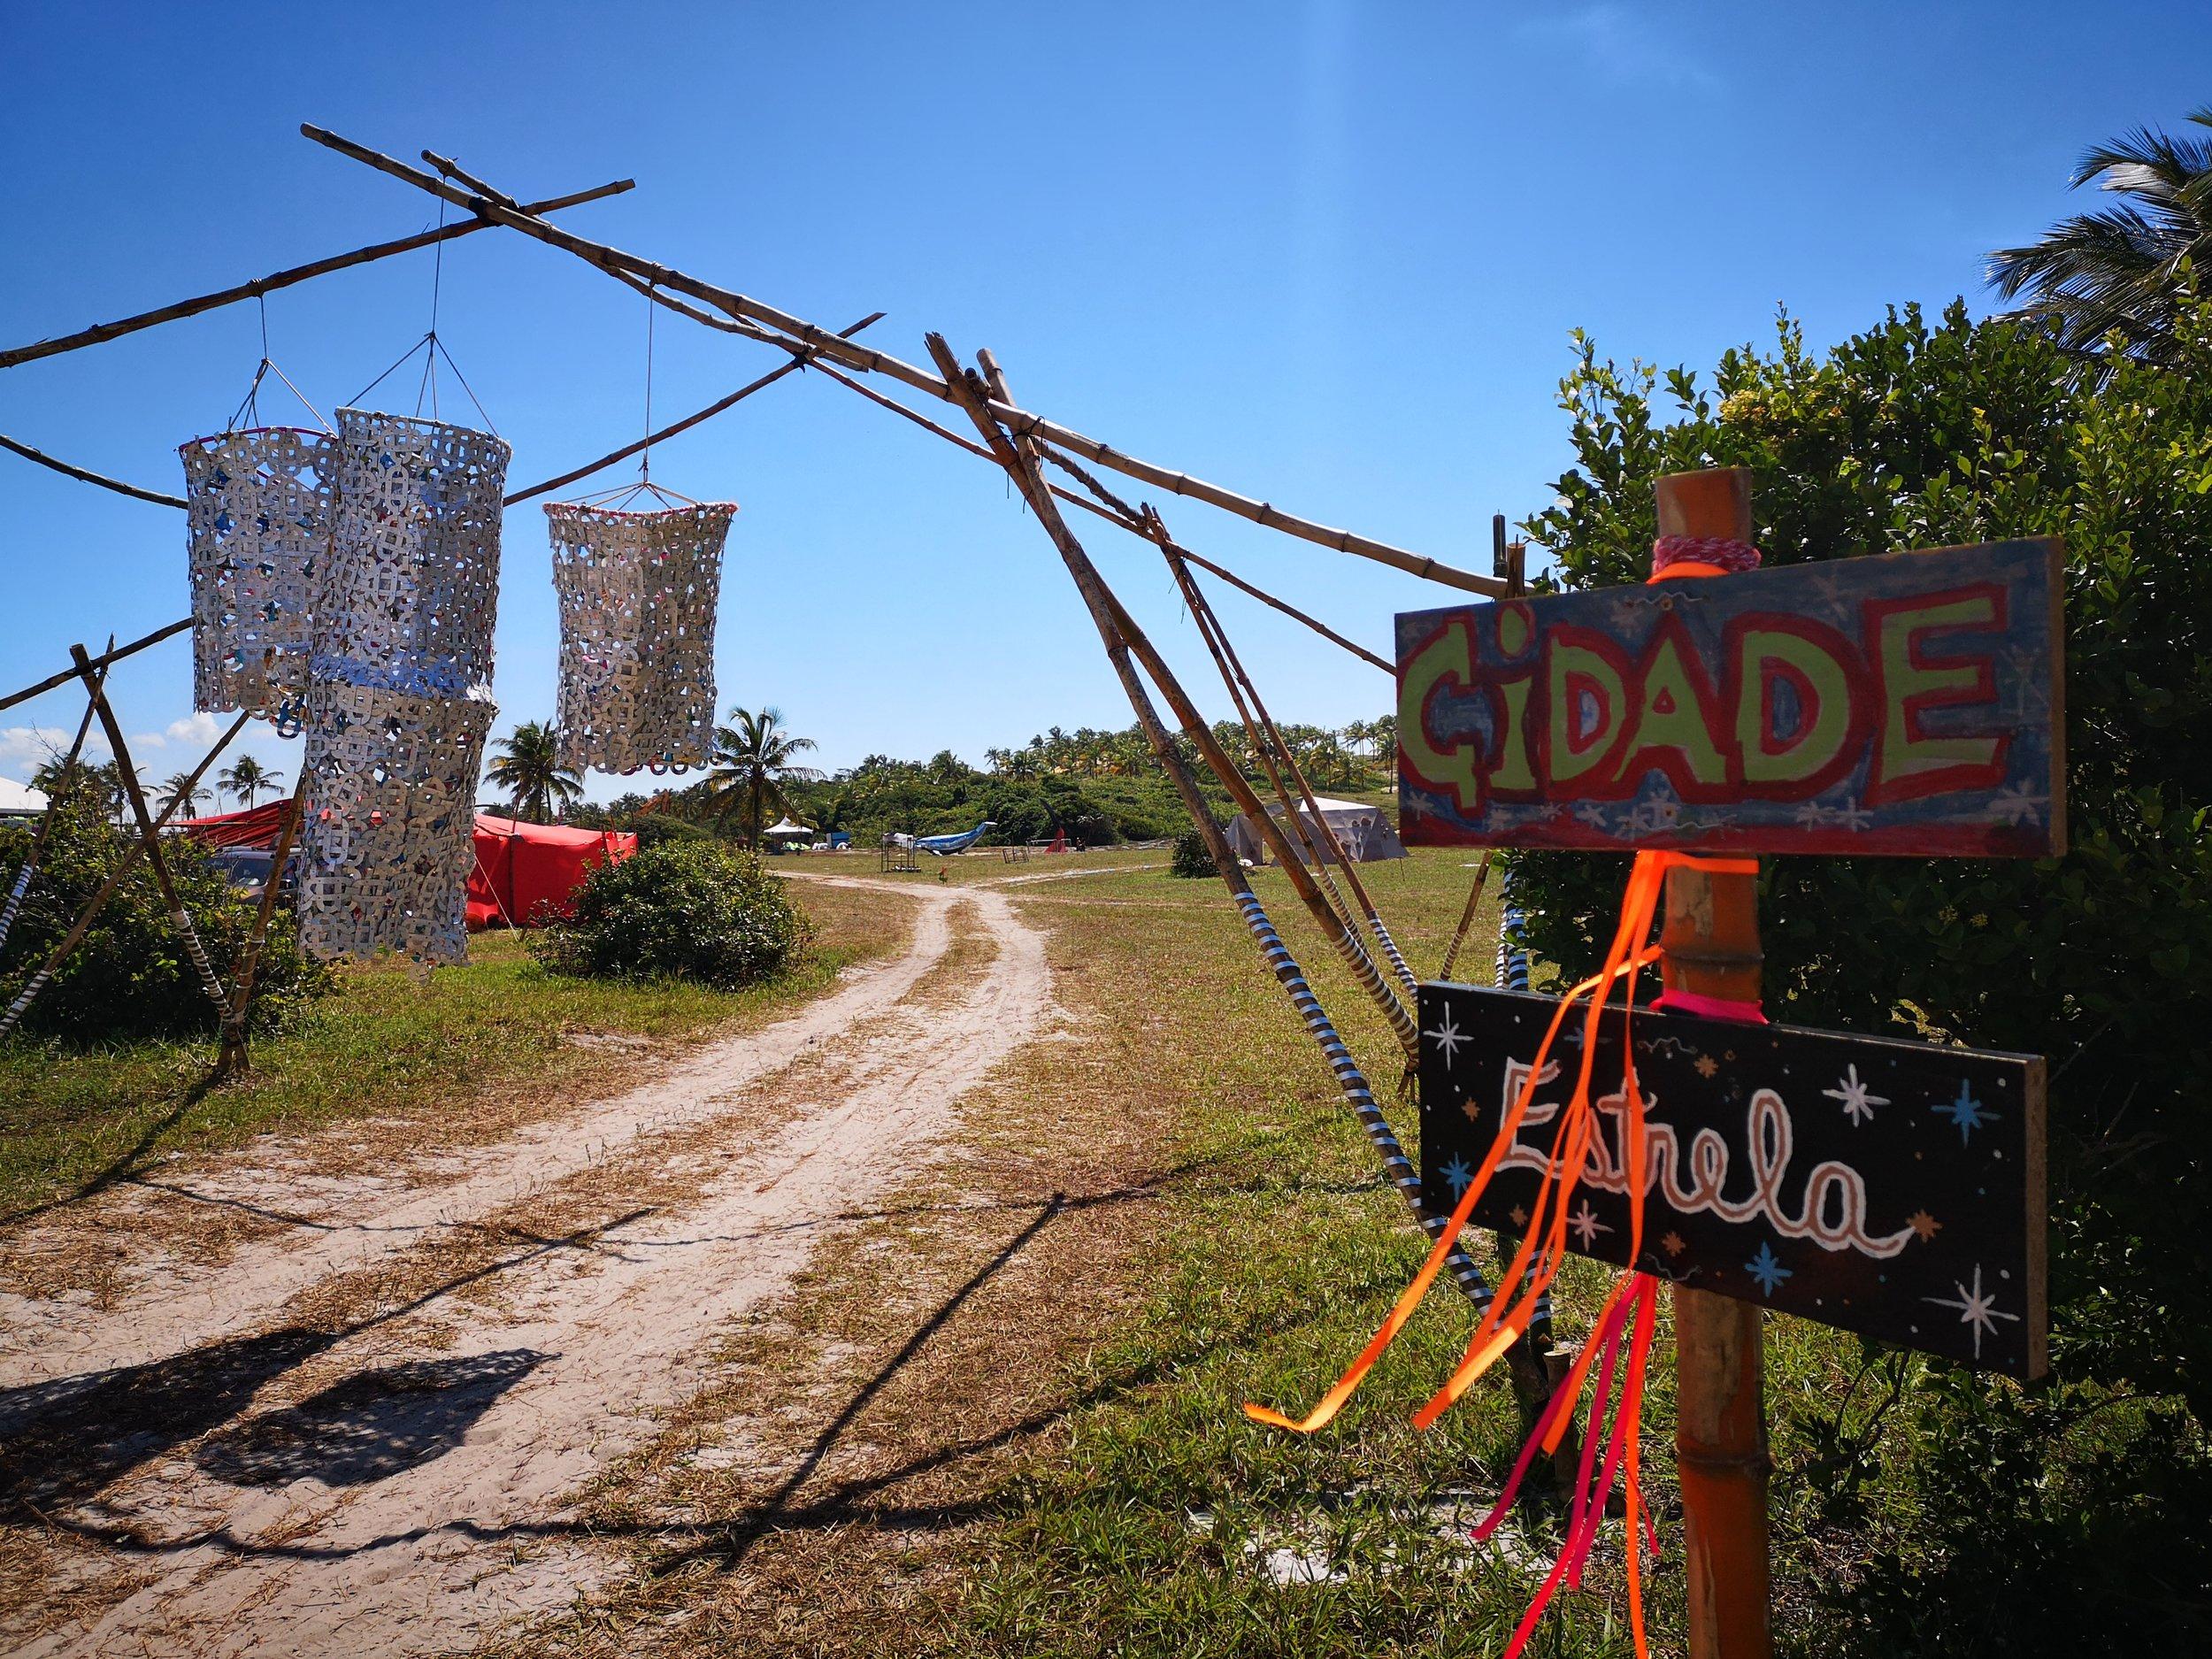 The entrance of the Tropical Burn Festival. 'Cidade Estrela' means 'Star City'